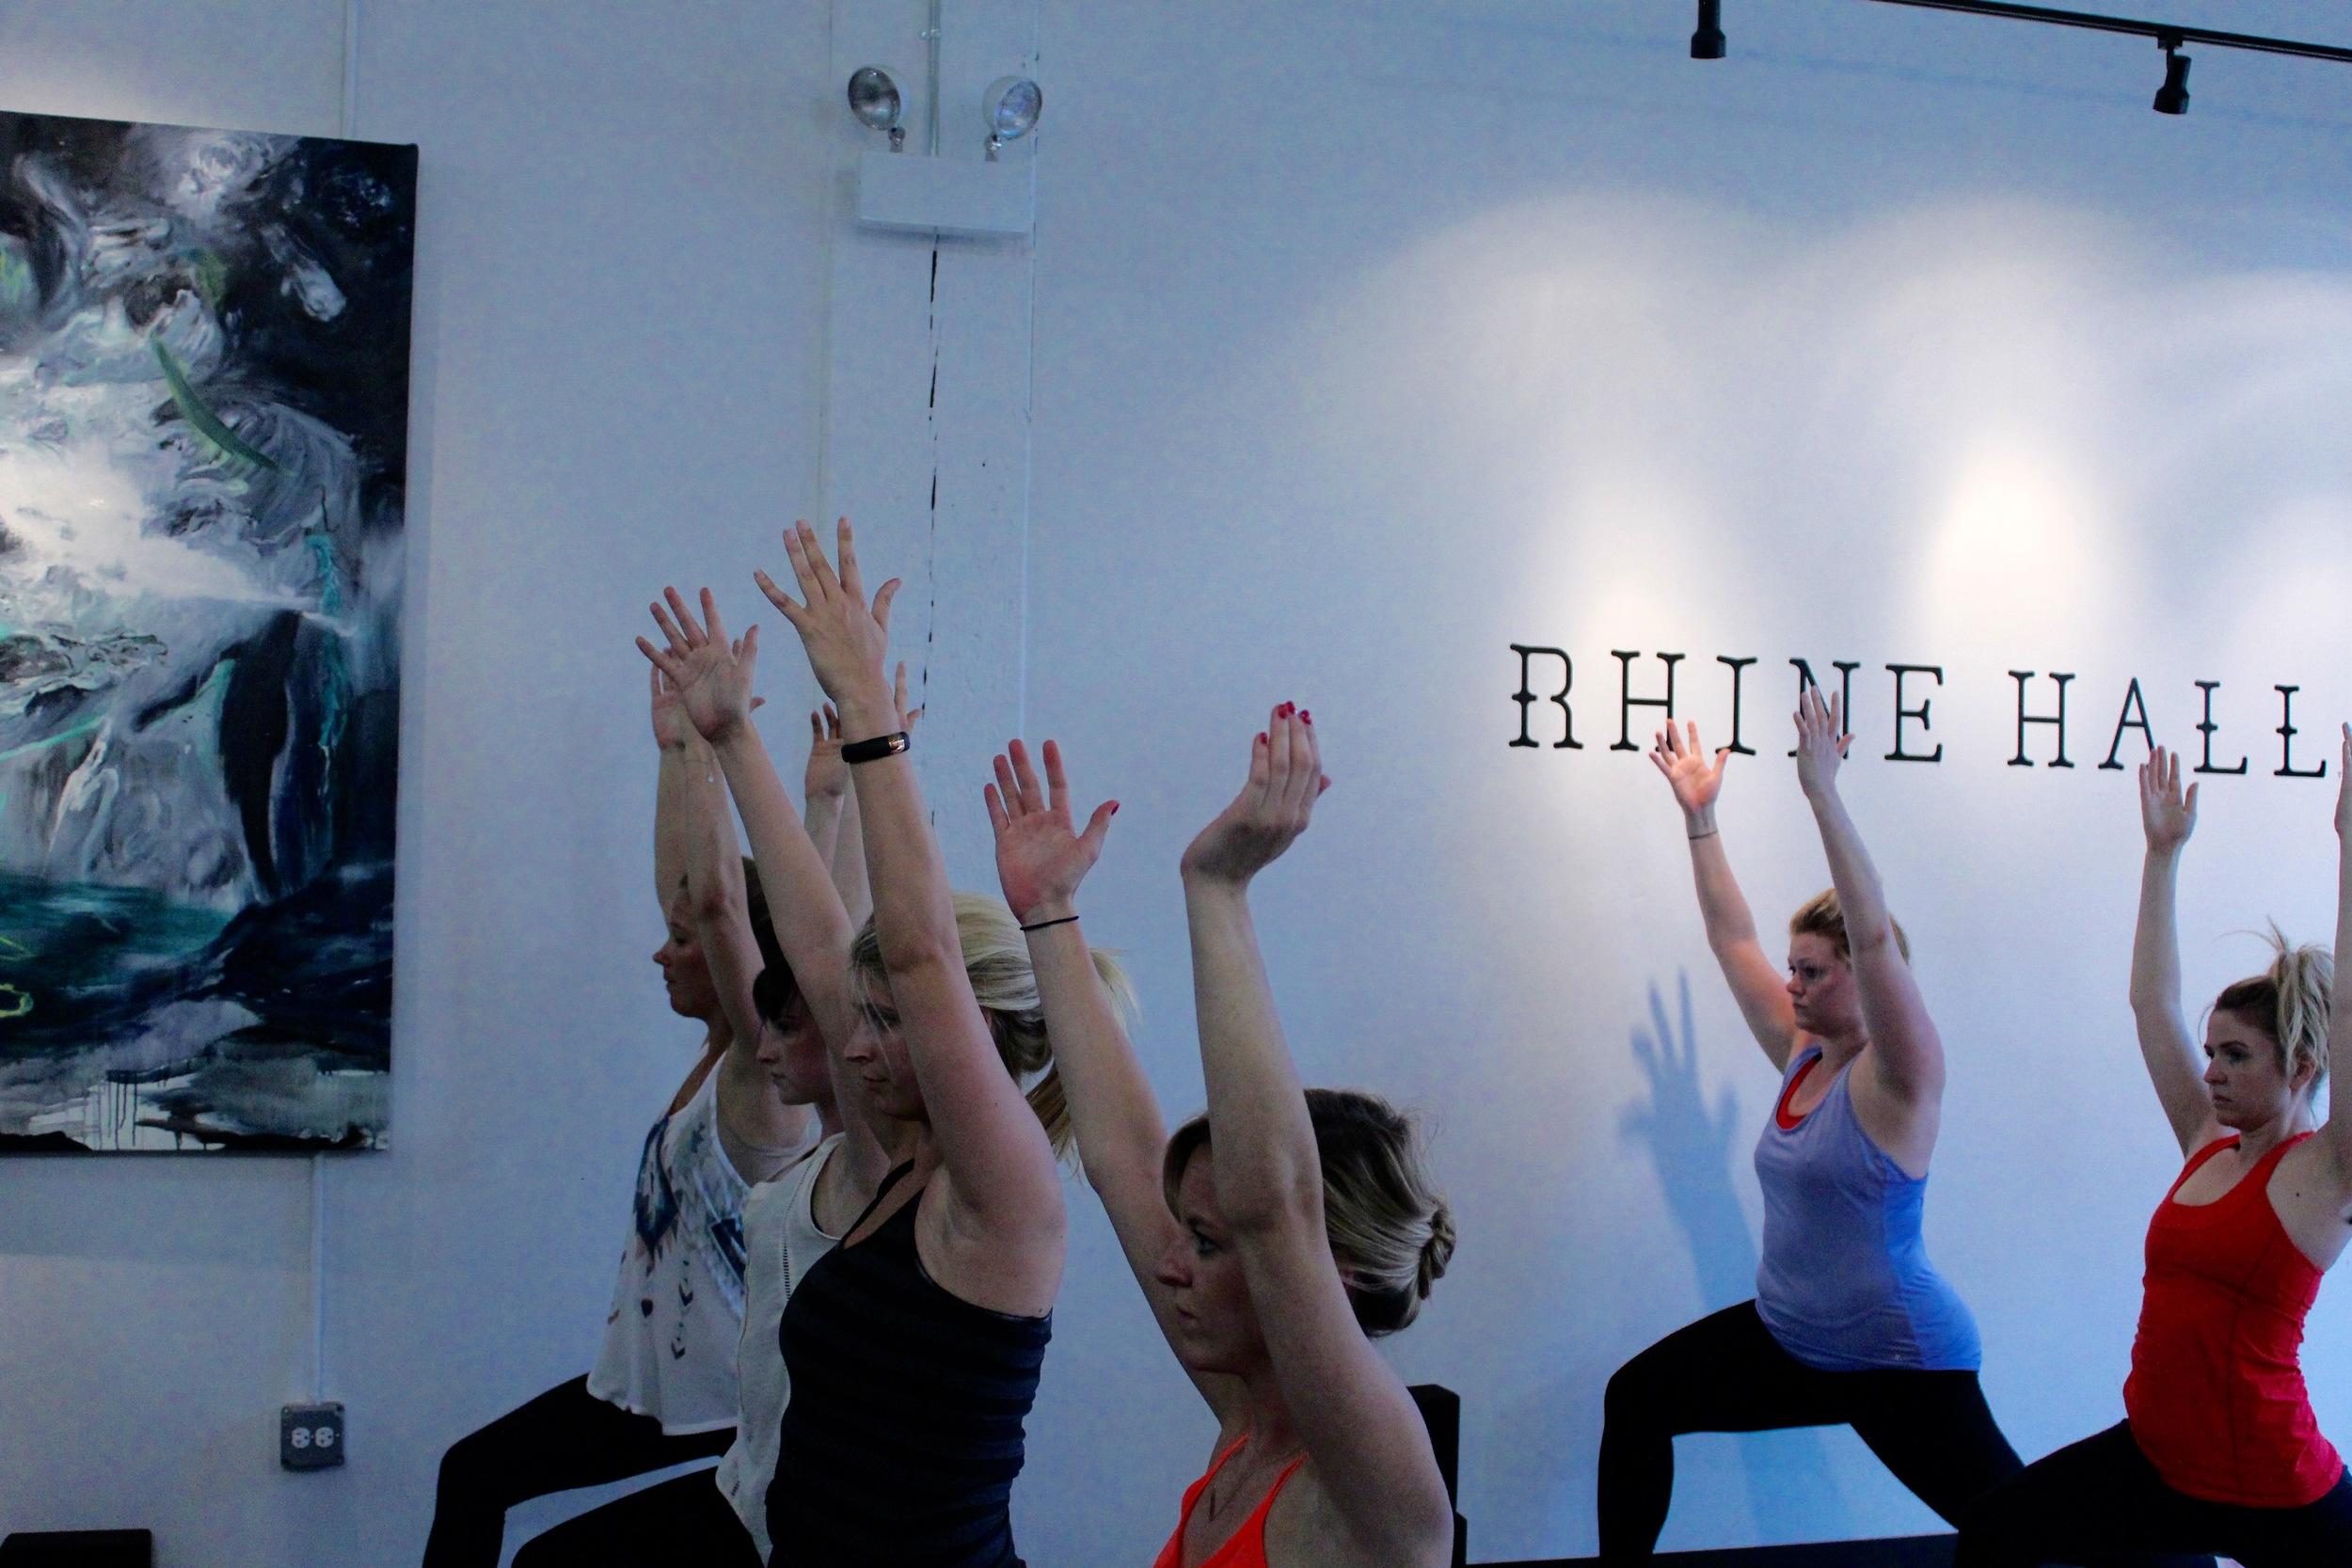 yoga-plus-rhine-hall-fruit-brandy-distillery-tour-cocktails466.jpg